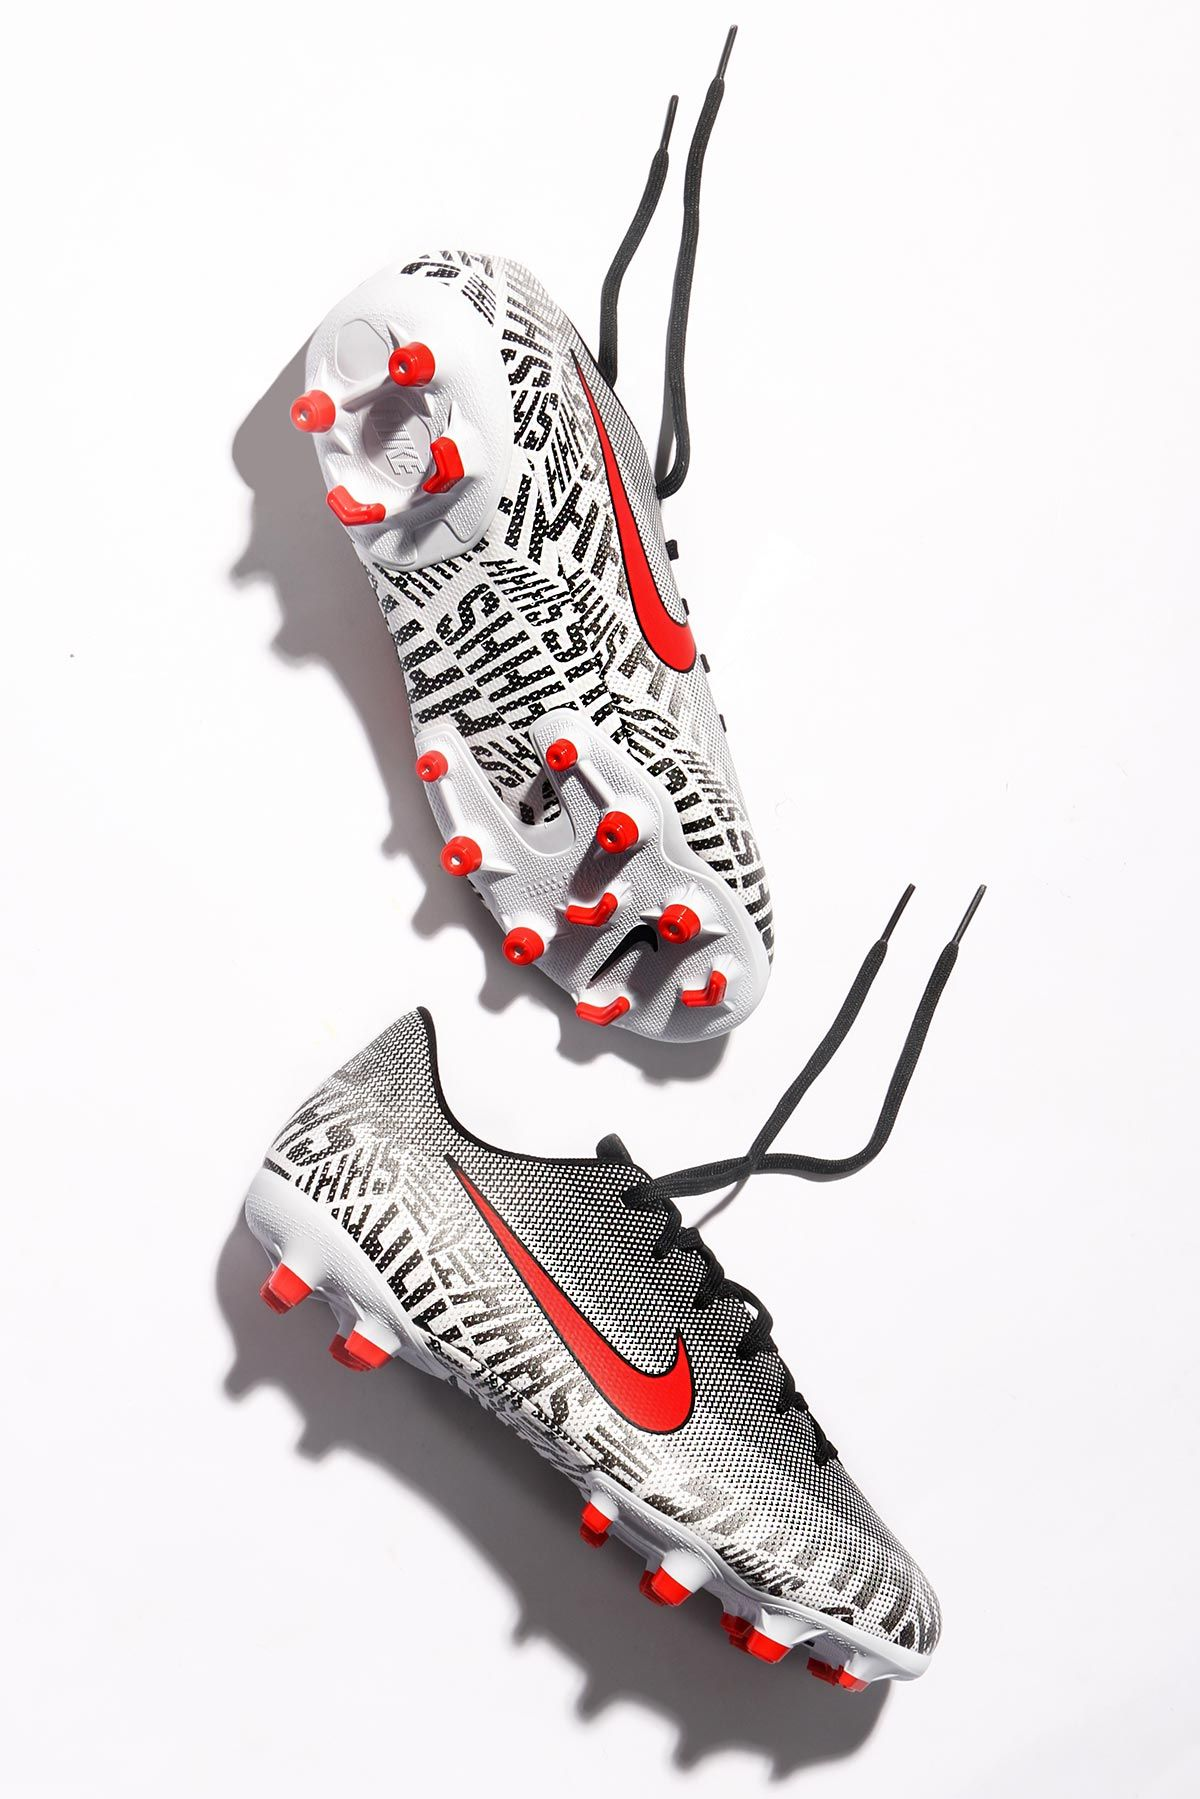 f793eb1f 📌Nike Mercurial Vapor XII Academy NJR MG 📌 Nuevas botas de fútbol Nike  Mercurial Vapor